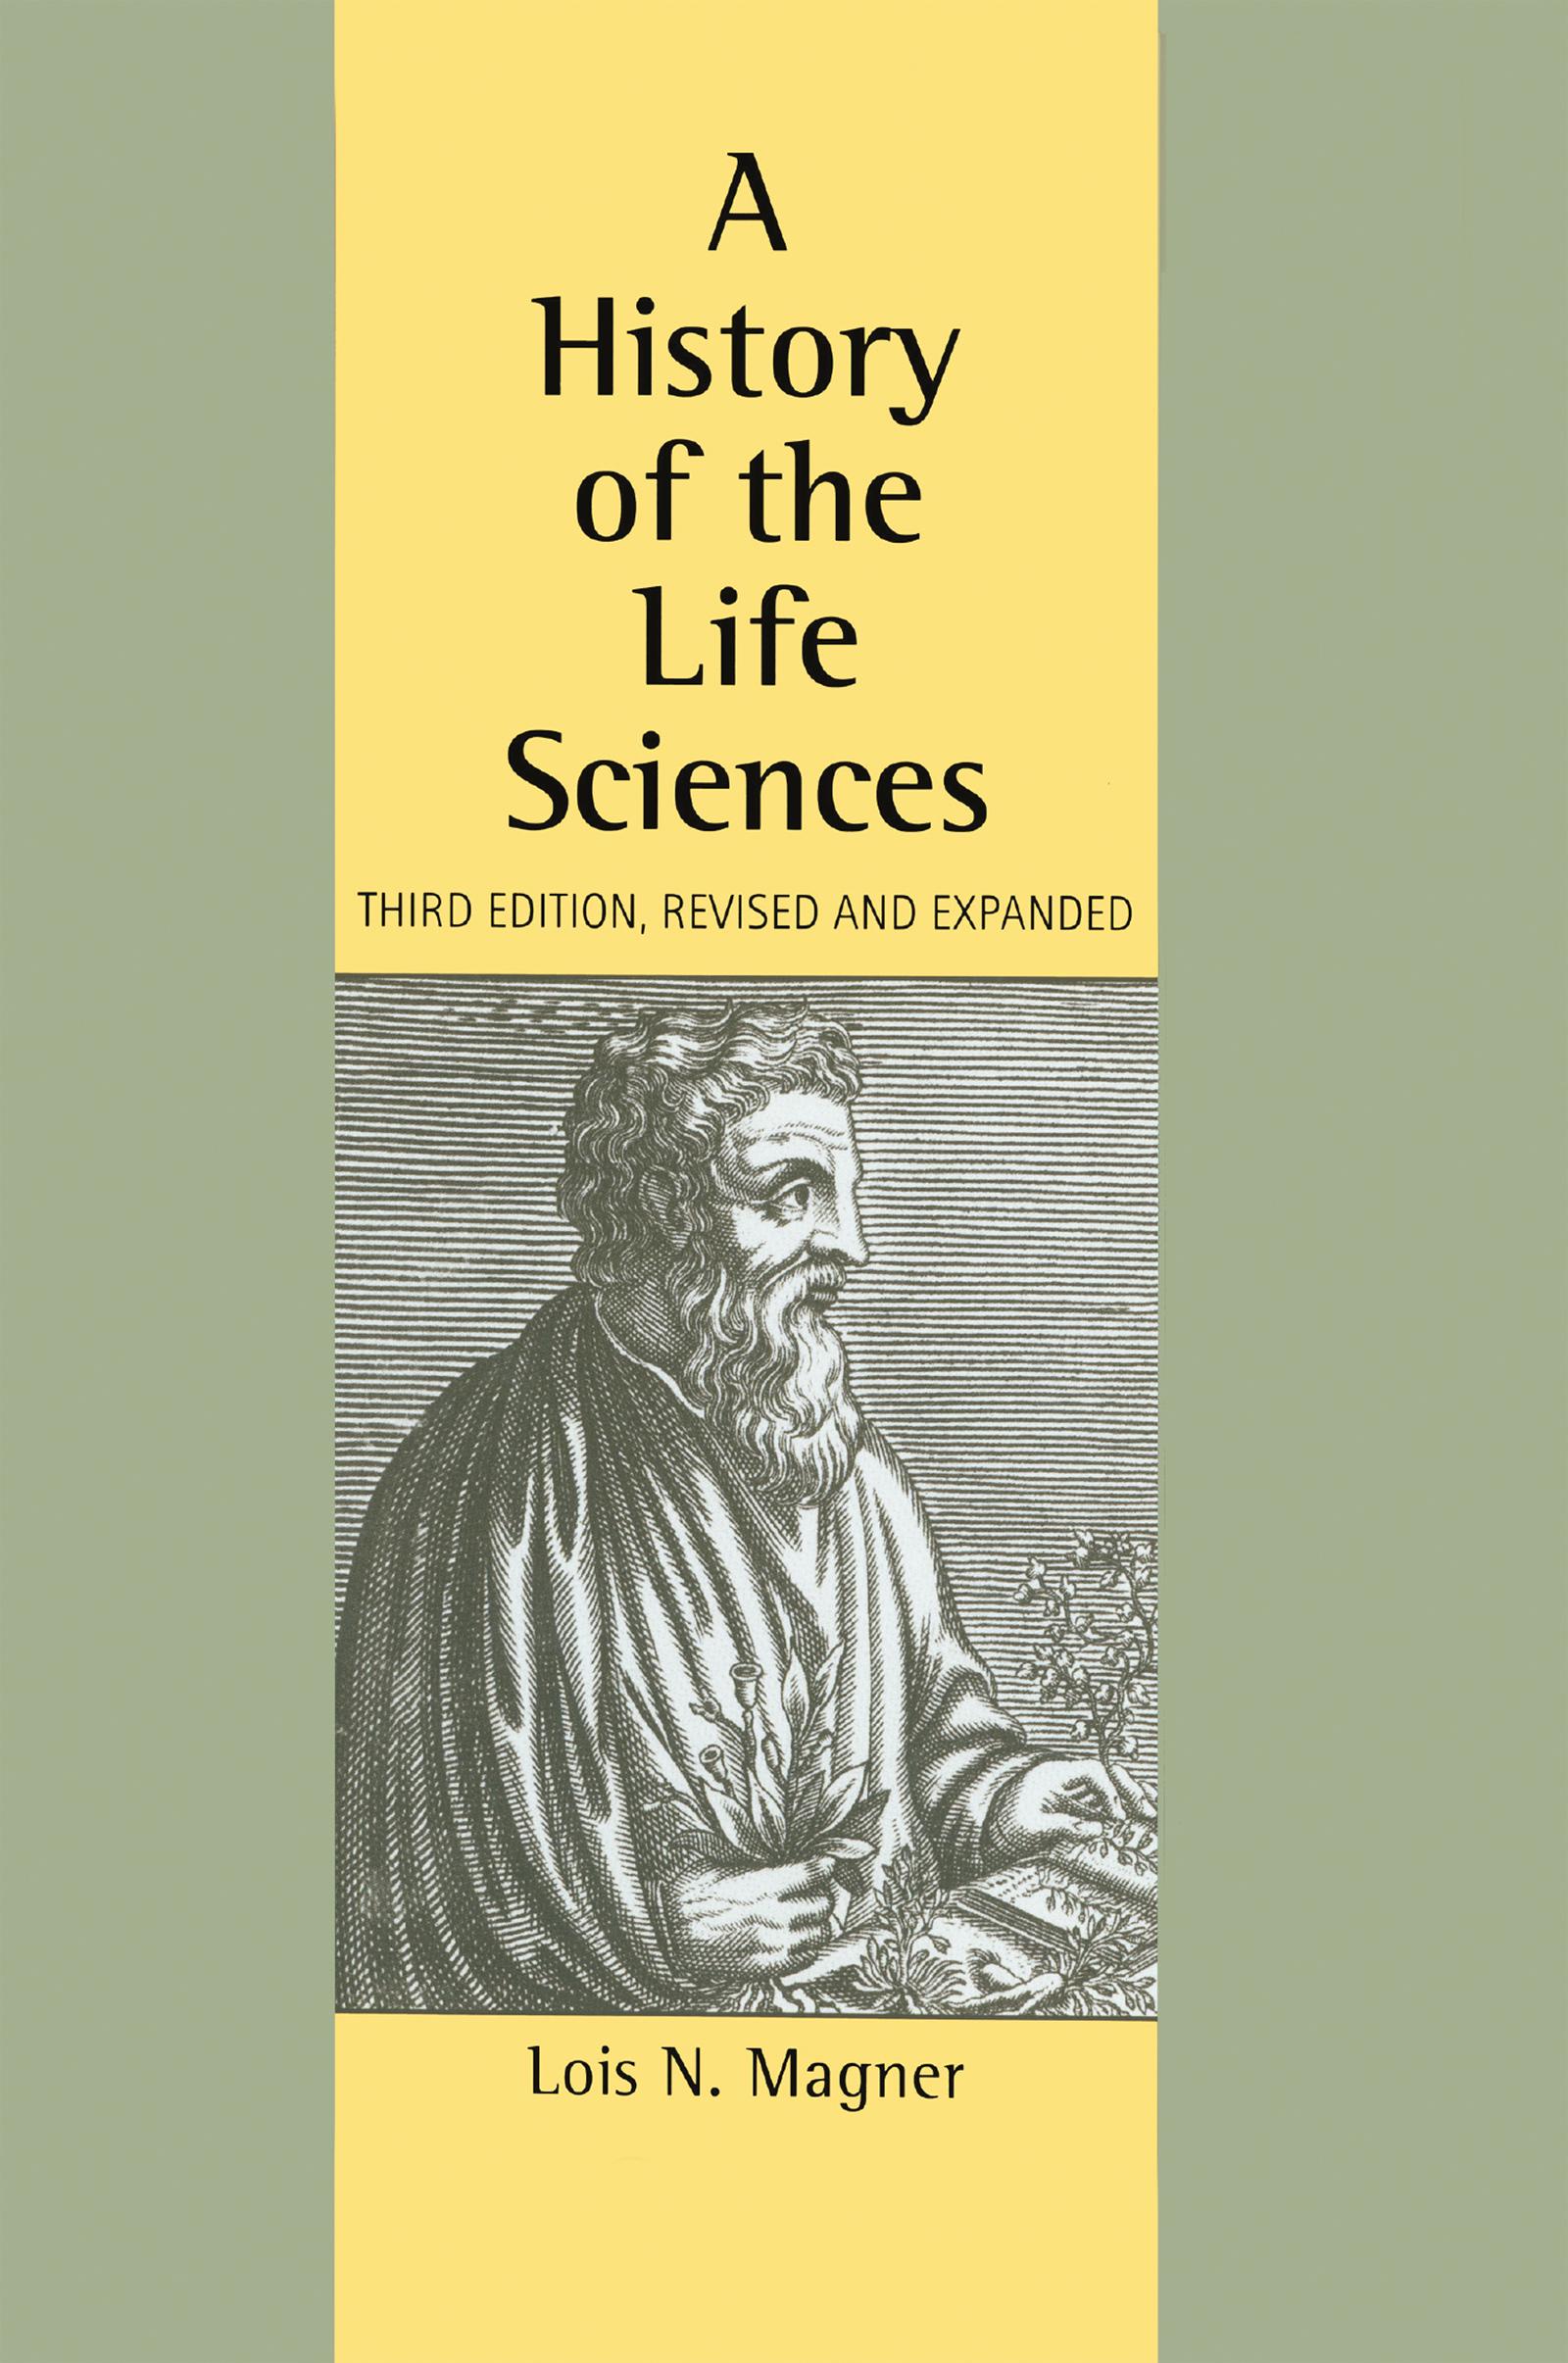 The renaissance and the scientific revolution